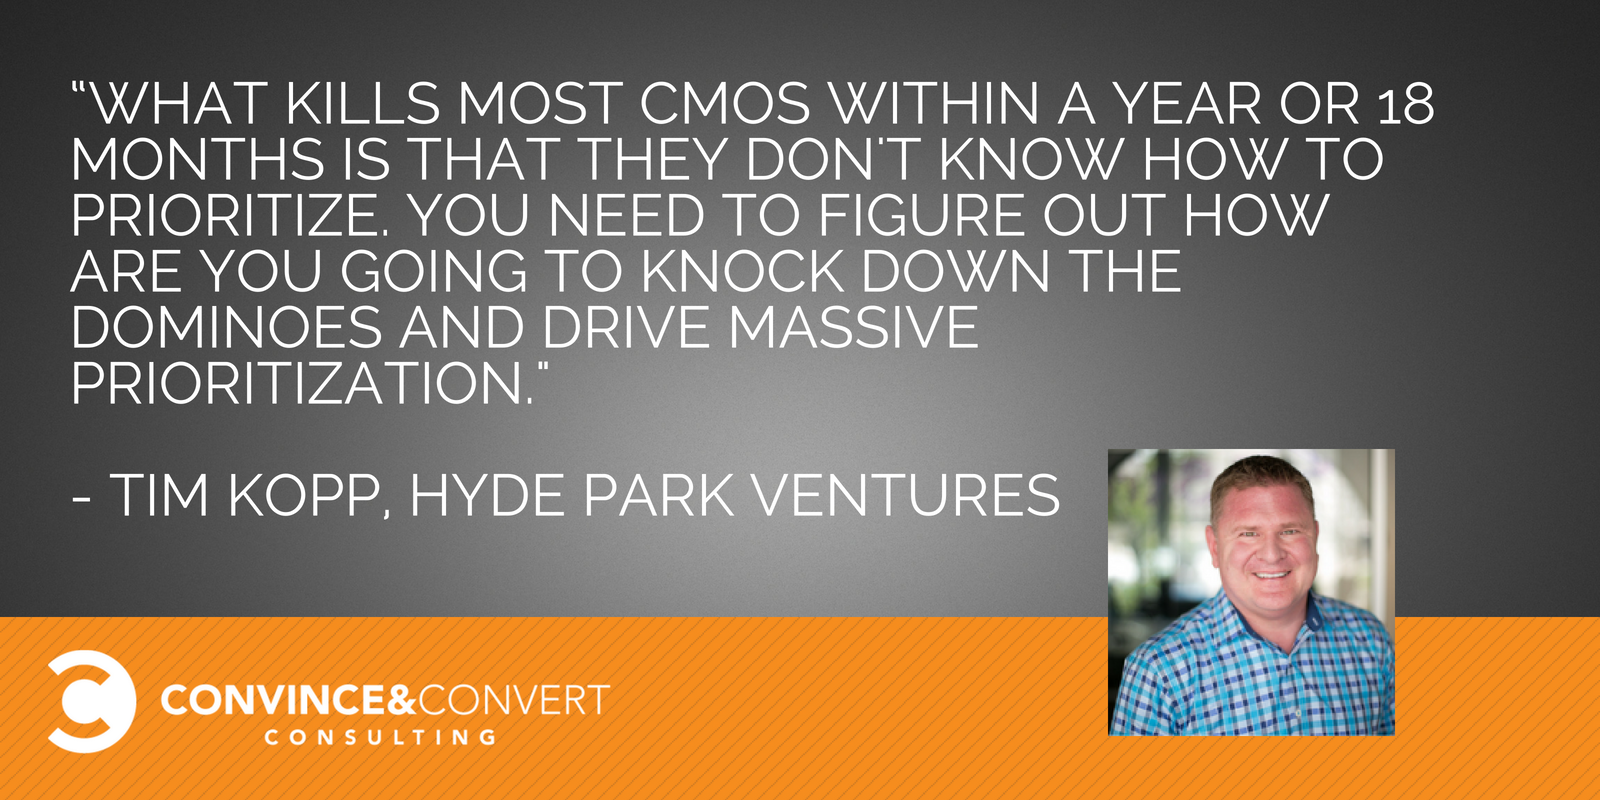 Tim Kopp Hyde Park Ventures